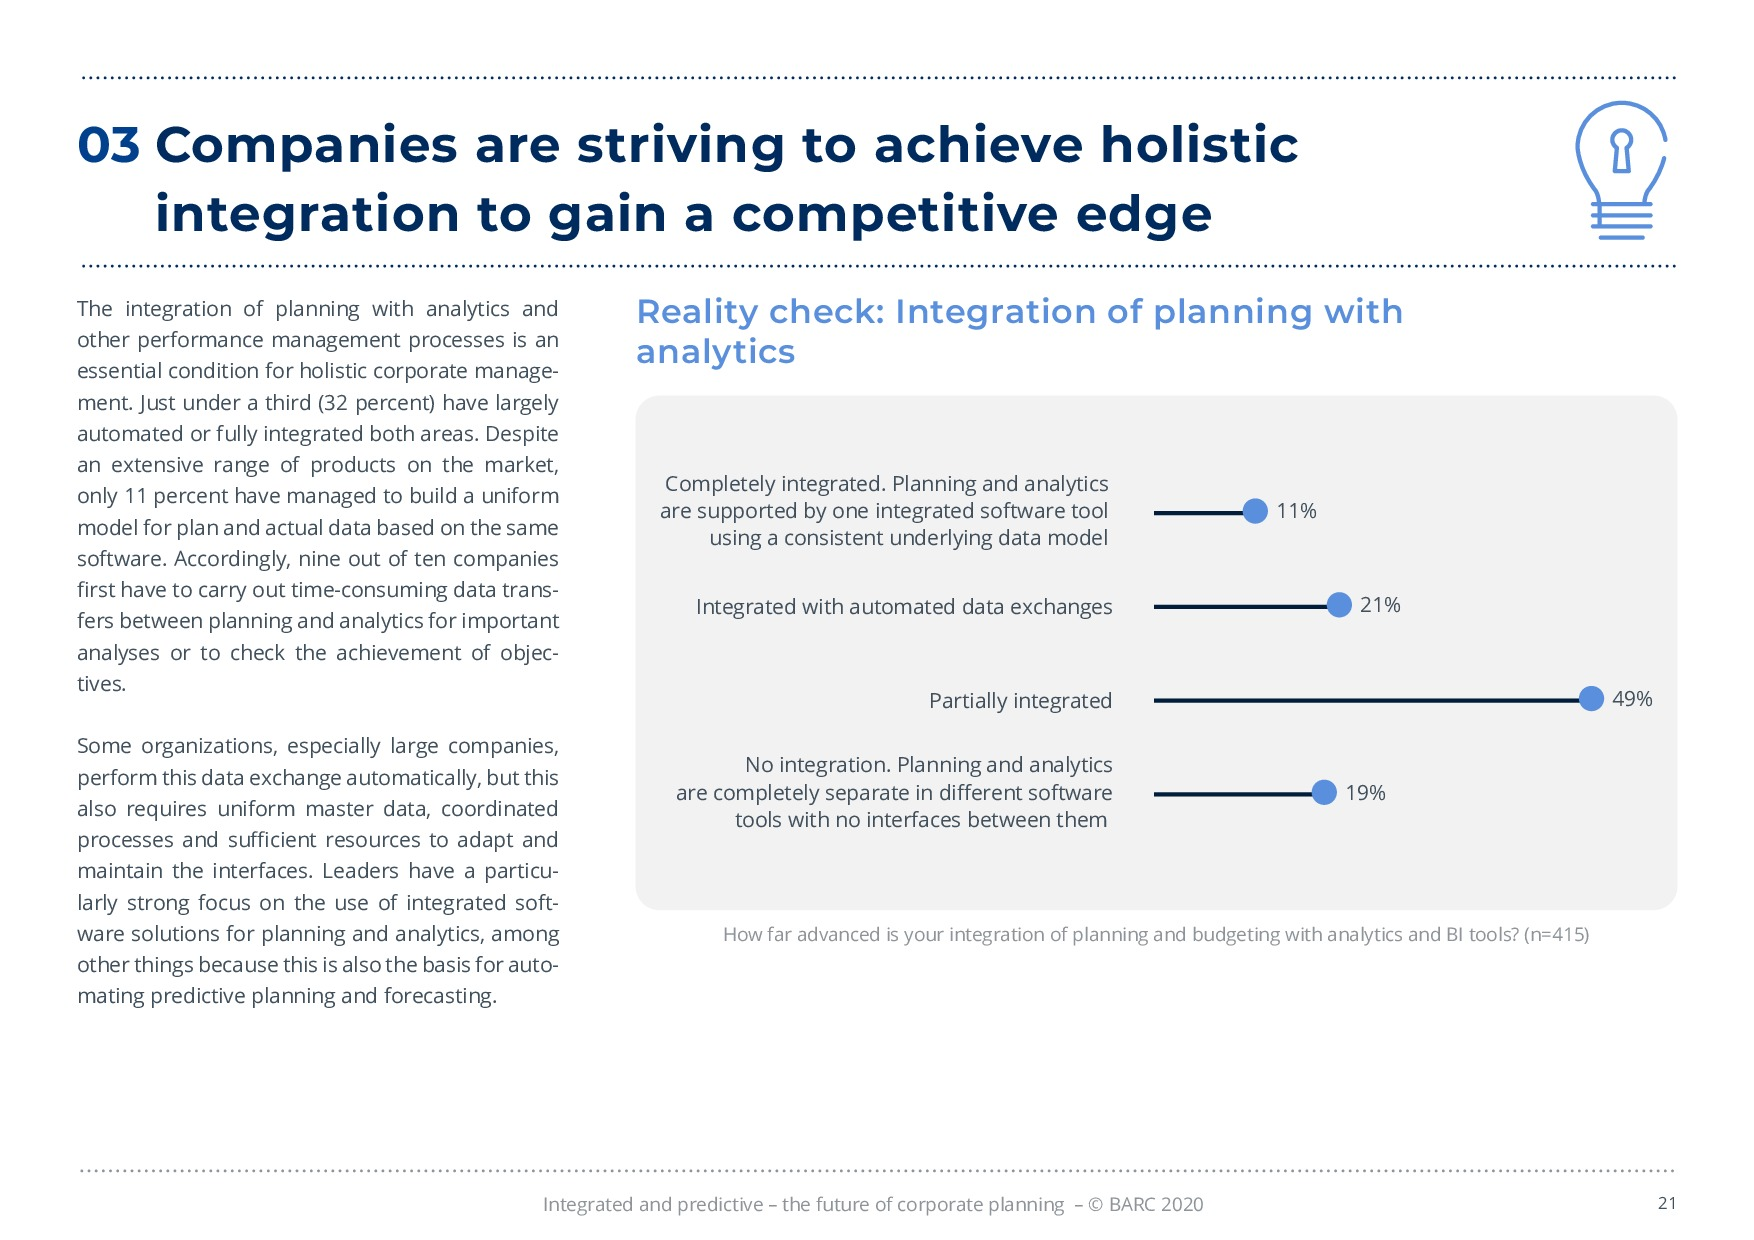 BARC – 統合と予測 – 経営計画の未来 | Page 21